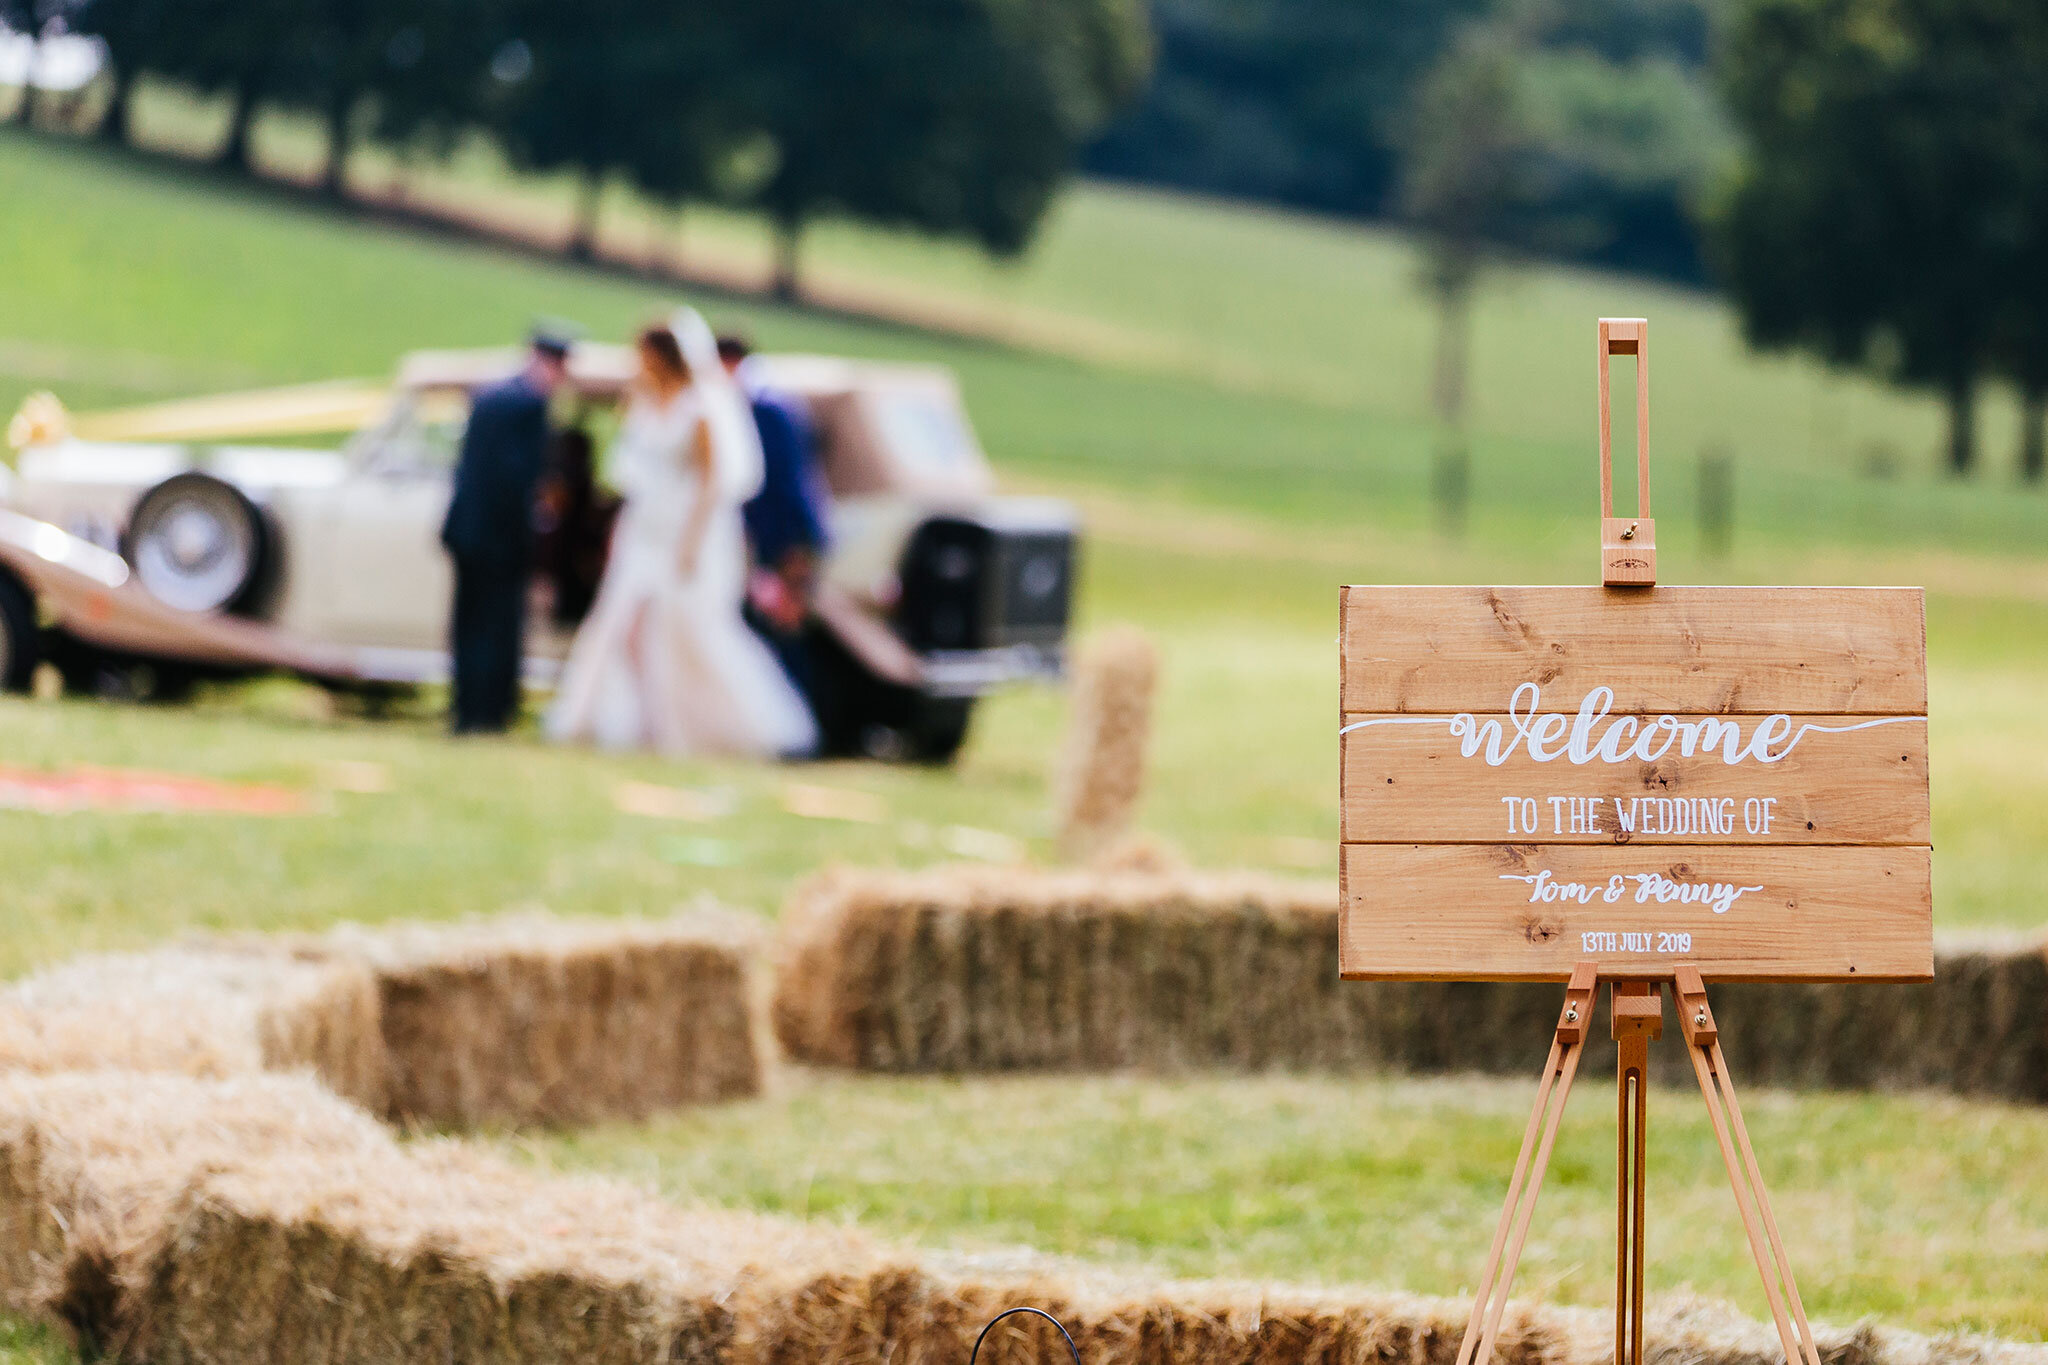 Fiesta-fields-maplehurst-farm-outdoor-wedding-west-sussex.jpeg